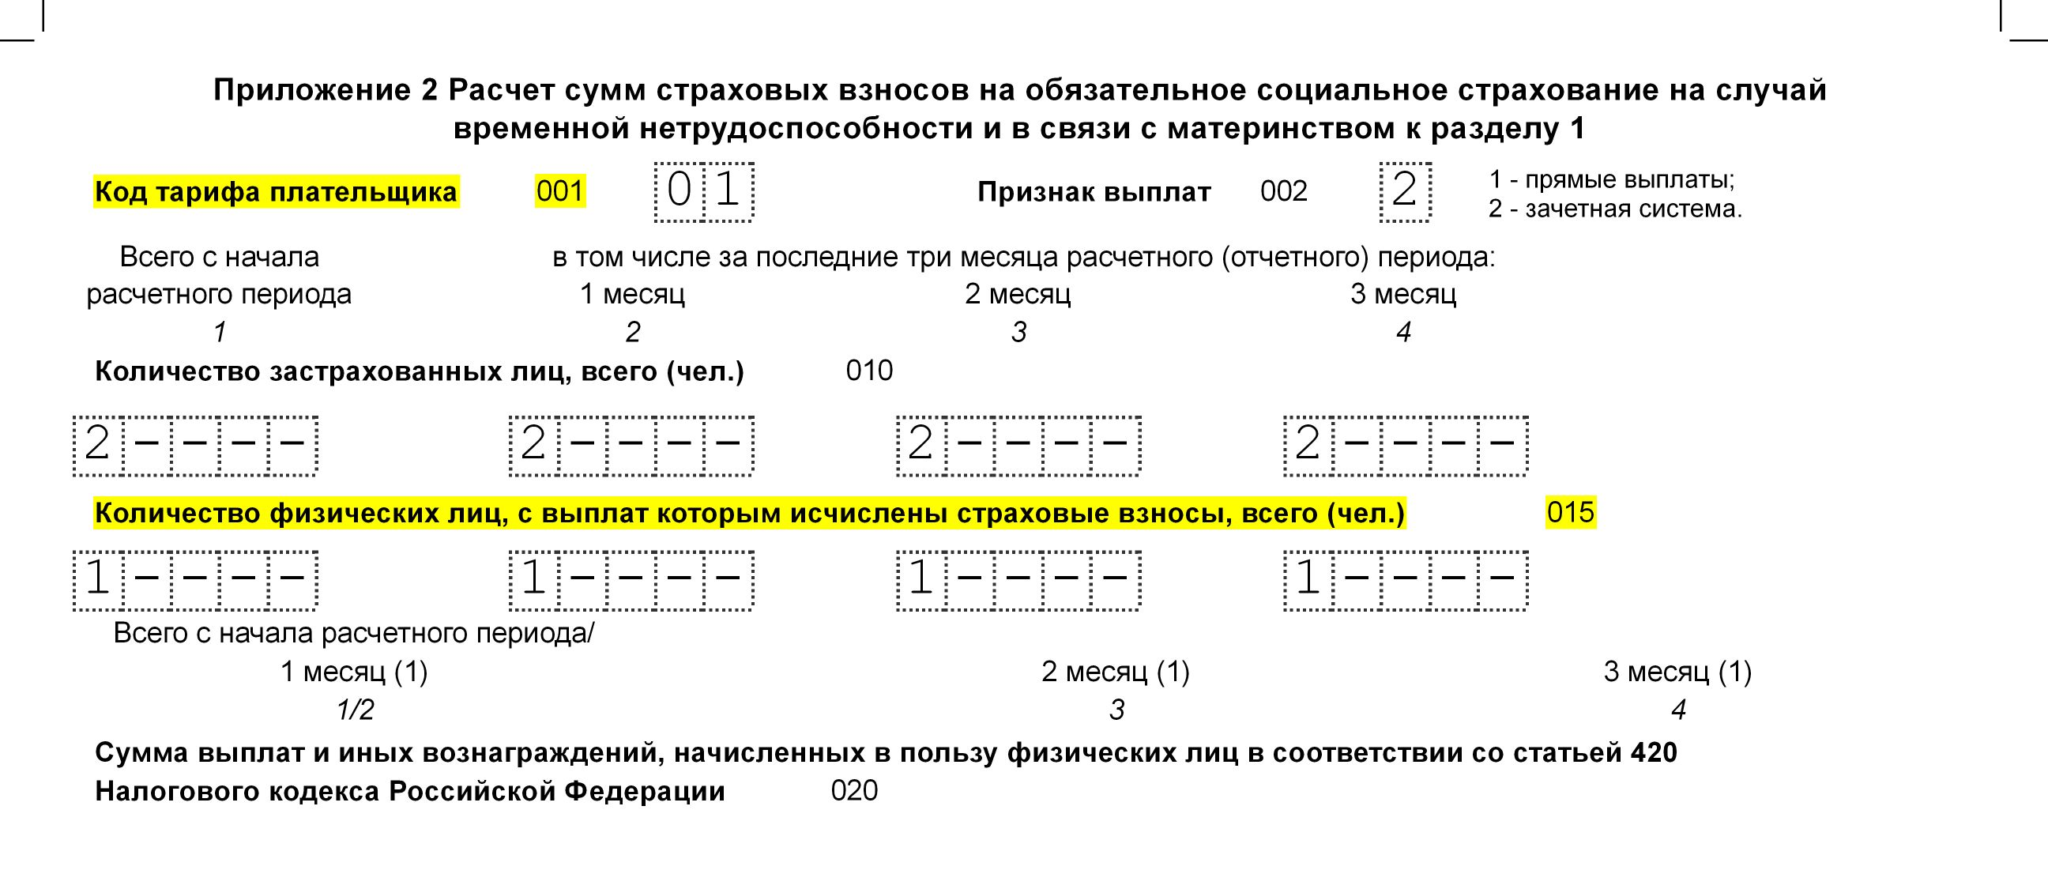 Форма РСВ Раздел 1 Приложение 2